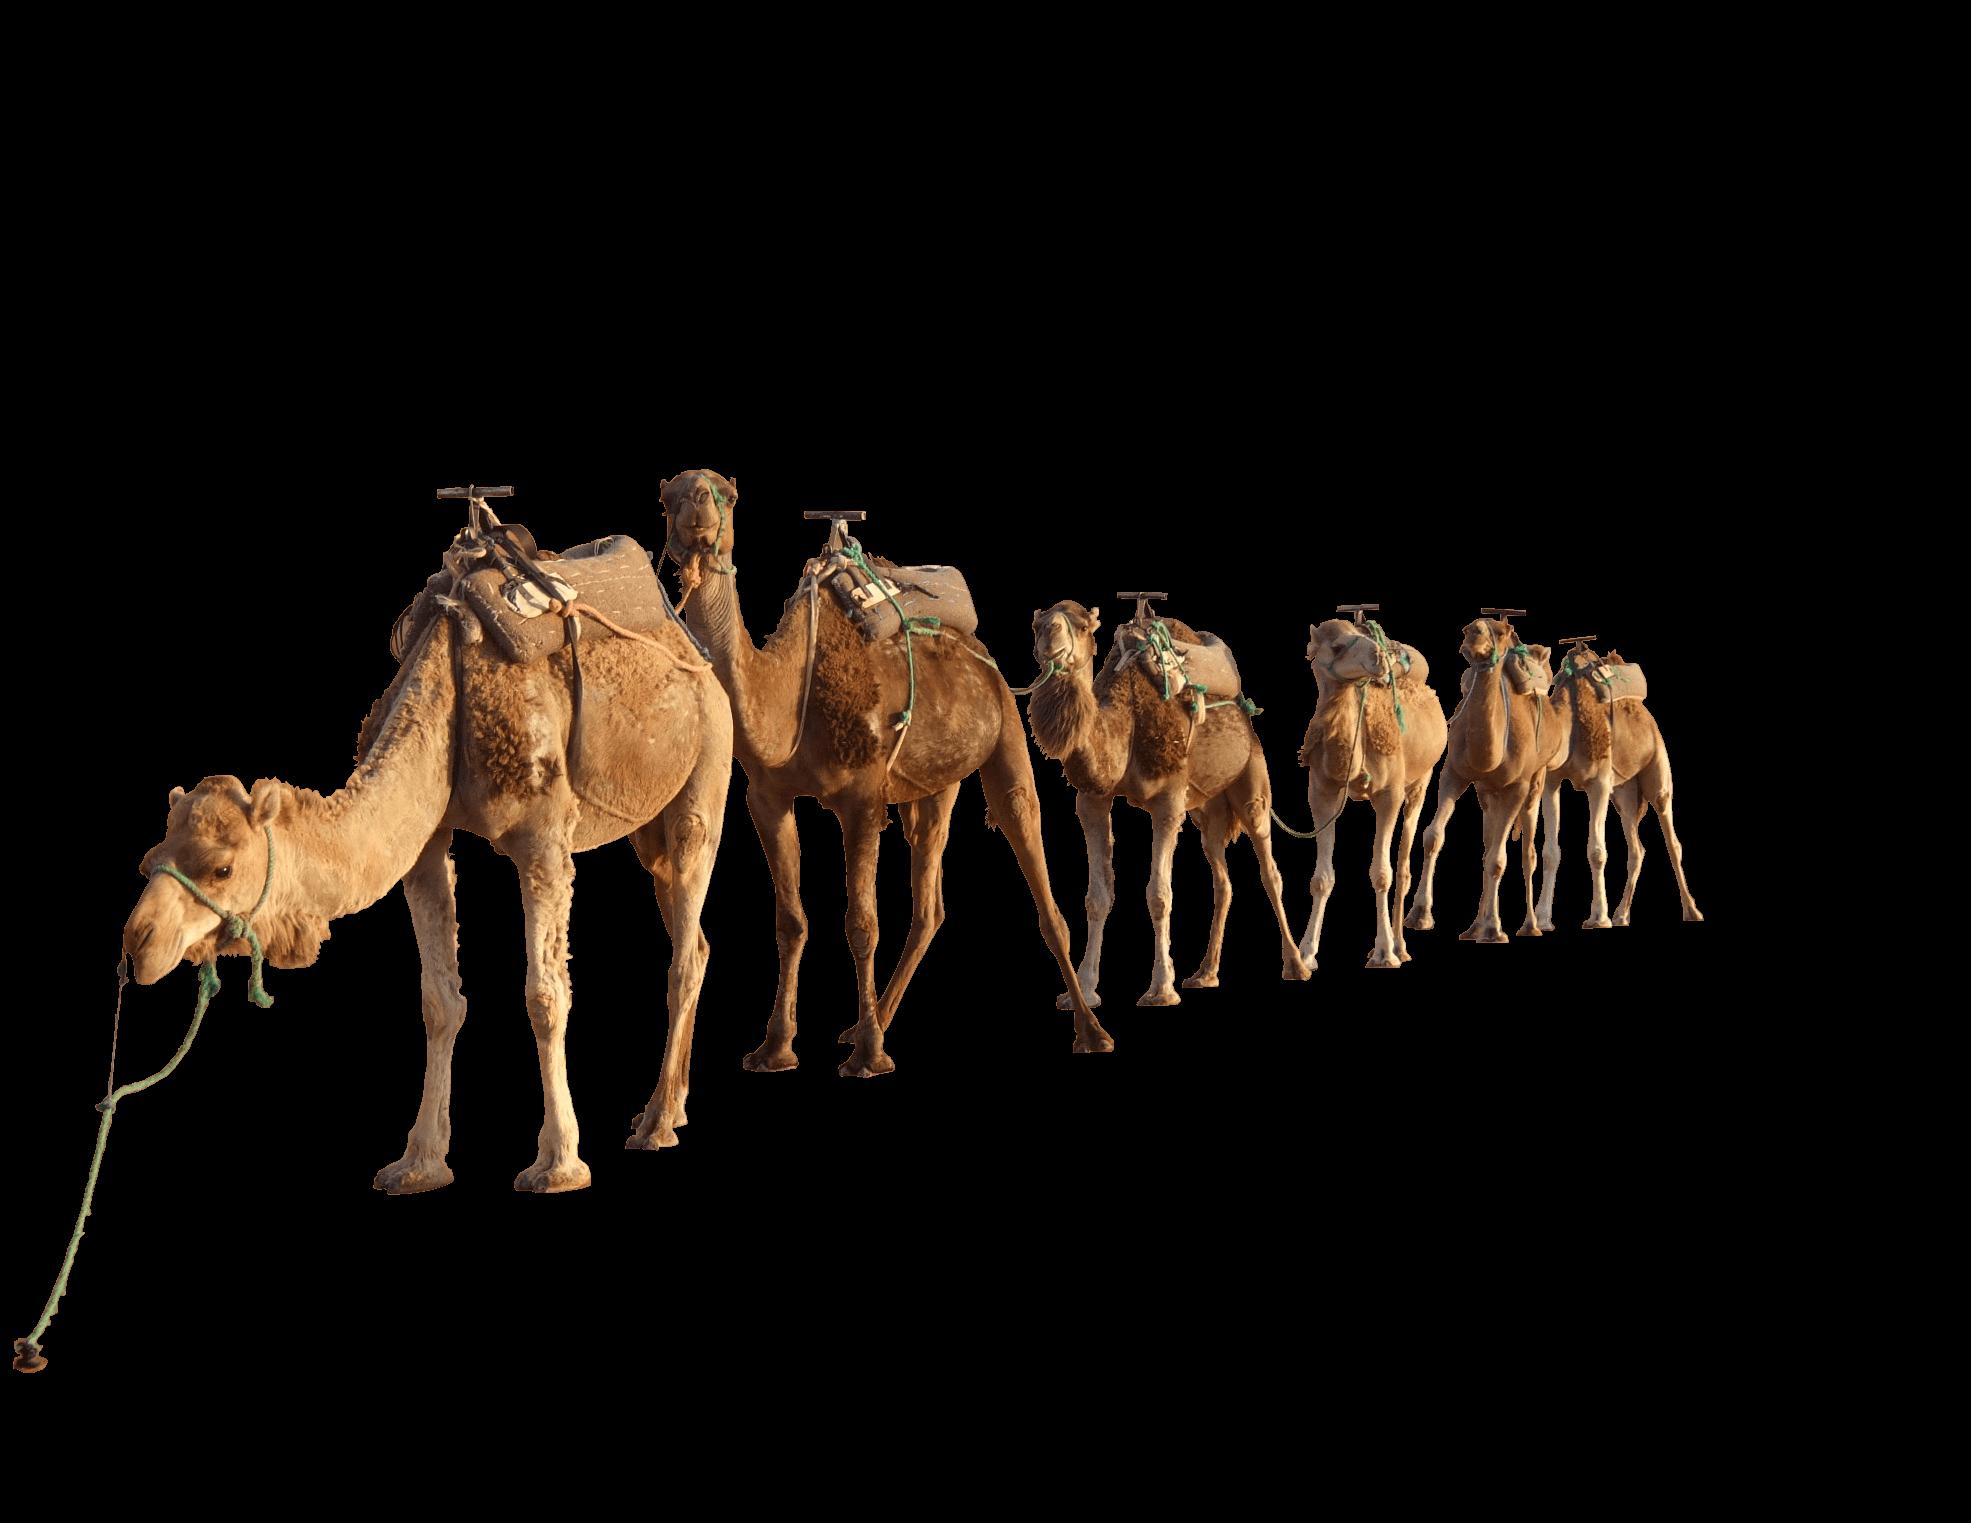 freeuse Camels In The Desert PNG Transparent Camels In The Desert